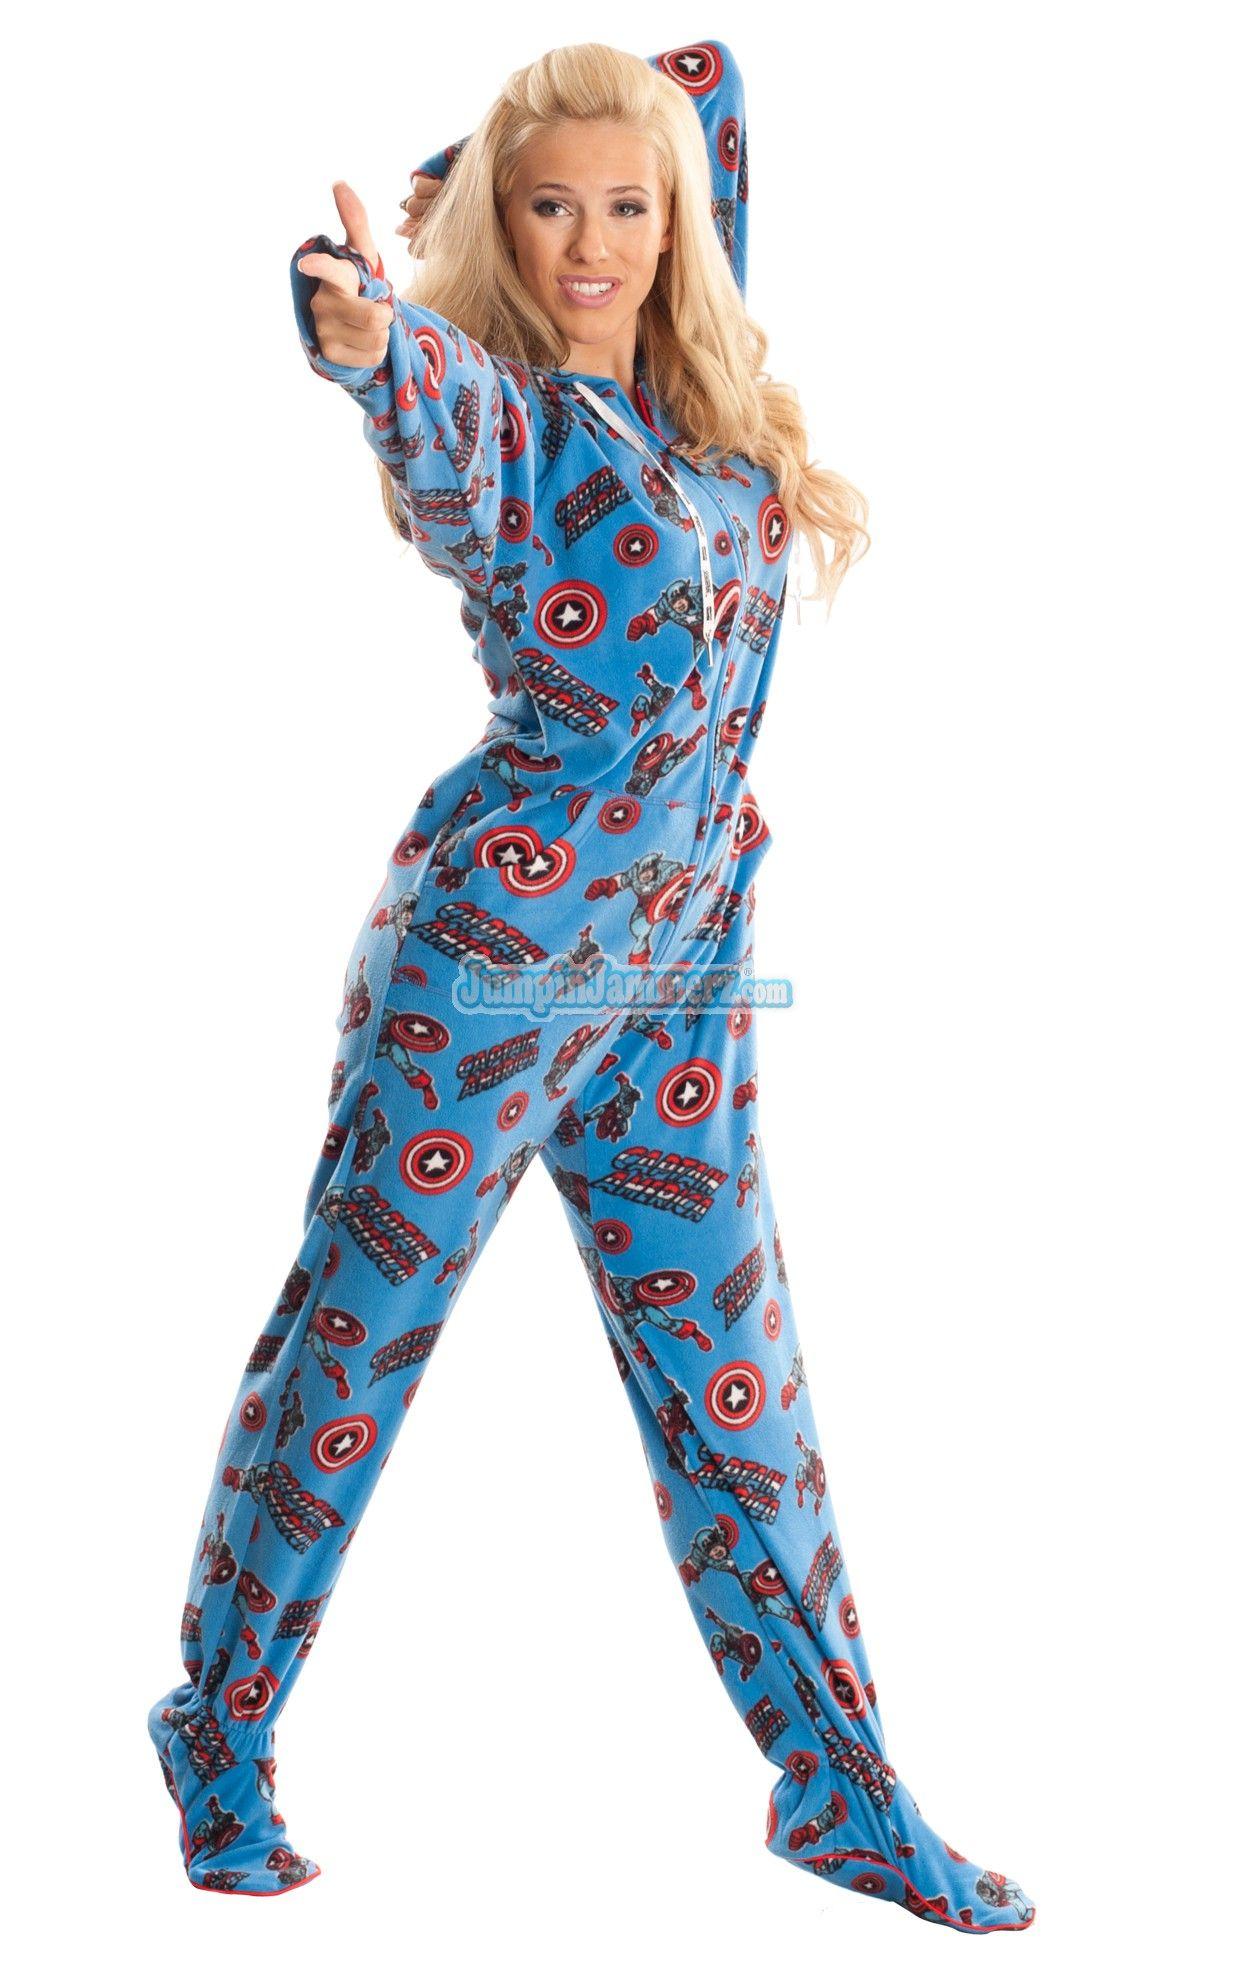 66fea9ca98e7 Captain America - Marvel Comics - Pajamas Footie PJs Onesies One ...